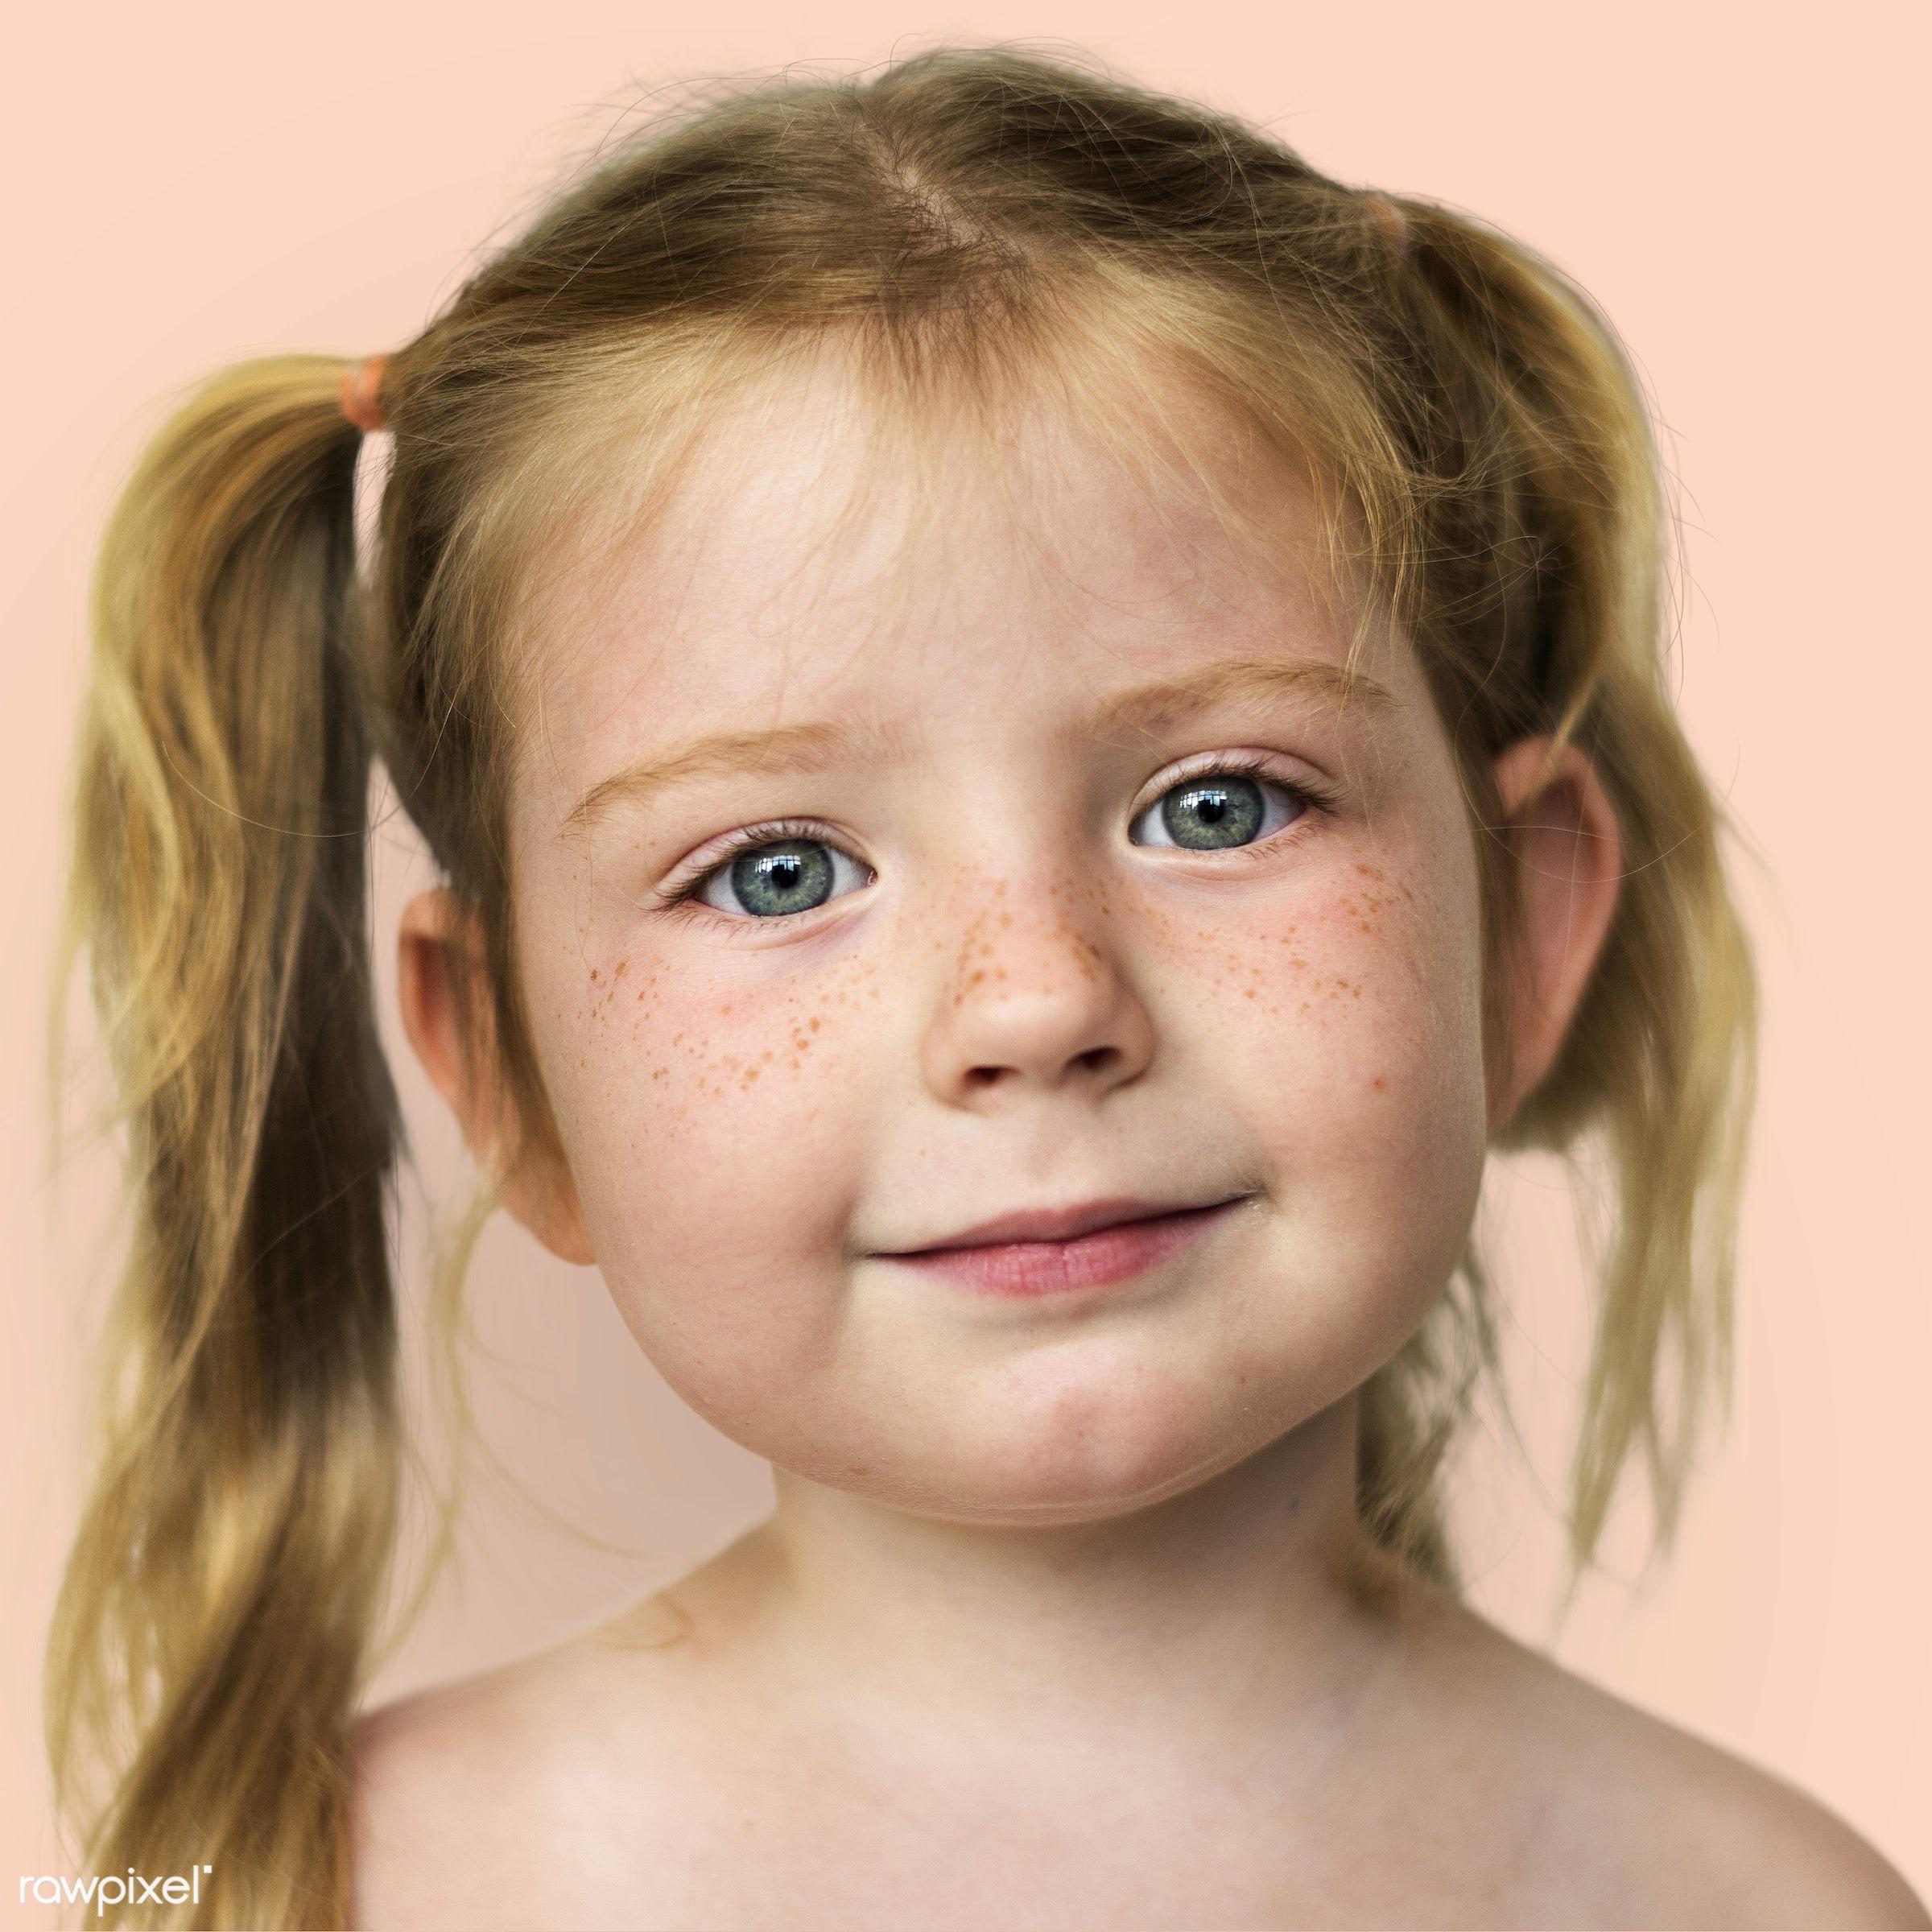 Portrait of a Norwegian girl - alone, caucasian, child, closeup, elementary, elementary age, emotion, europe, european,...